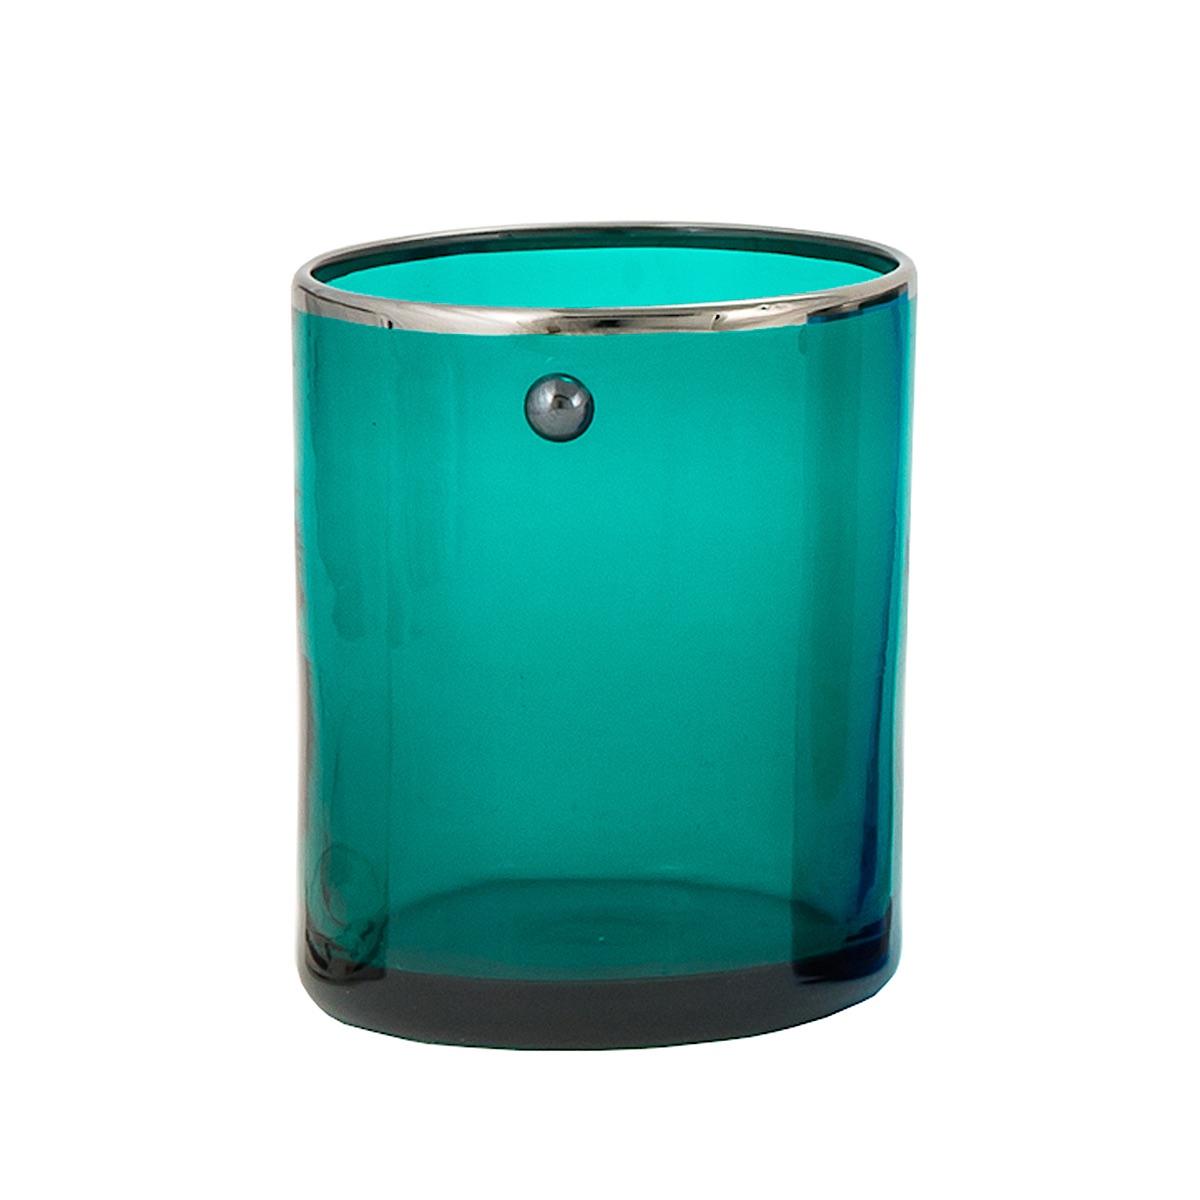 JAI-shot-glass-green-platinum-rim-murano-vodka-venice-handmade